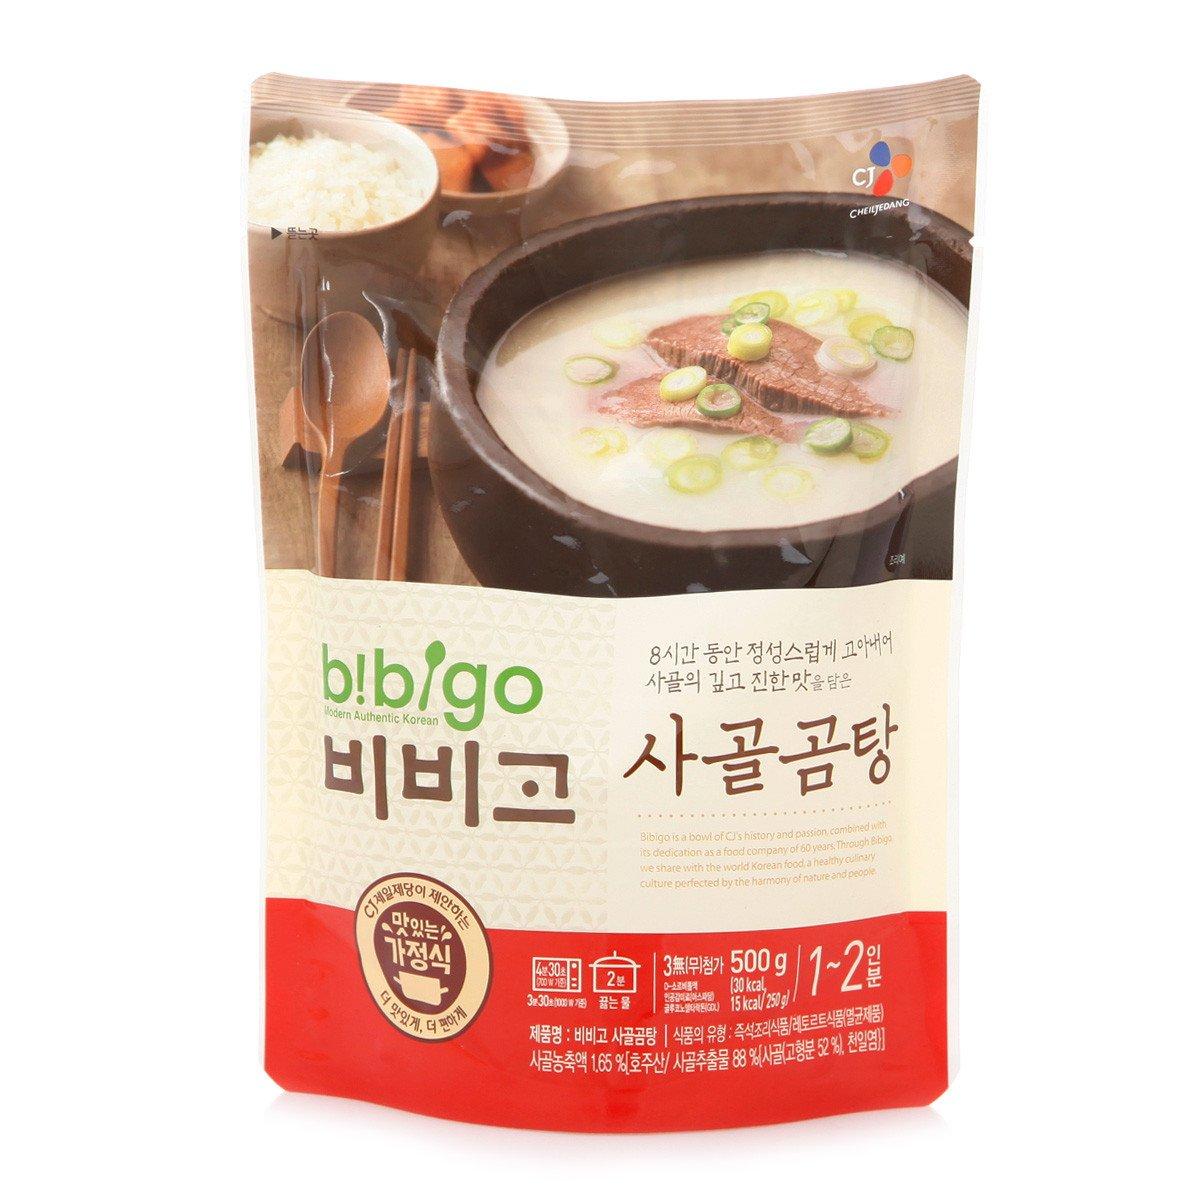 [ 6 Packs ] Korean Bibigo Pre-made Packaged Korean Beef Bone Broth Soup 500g 사골곰탕